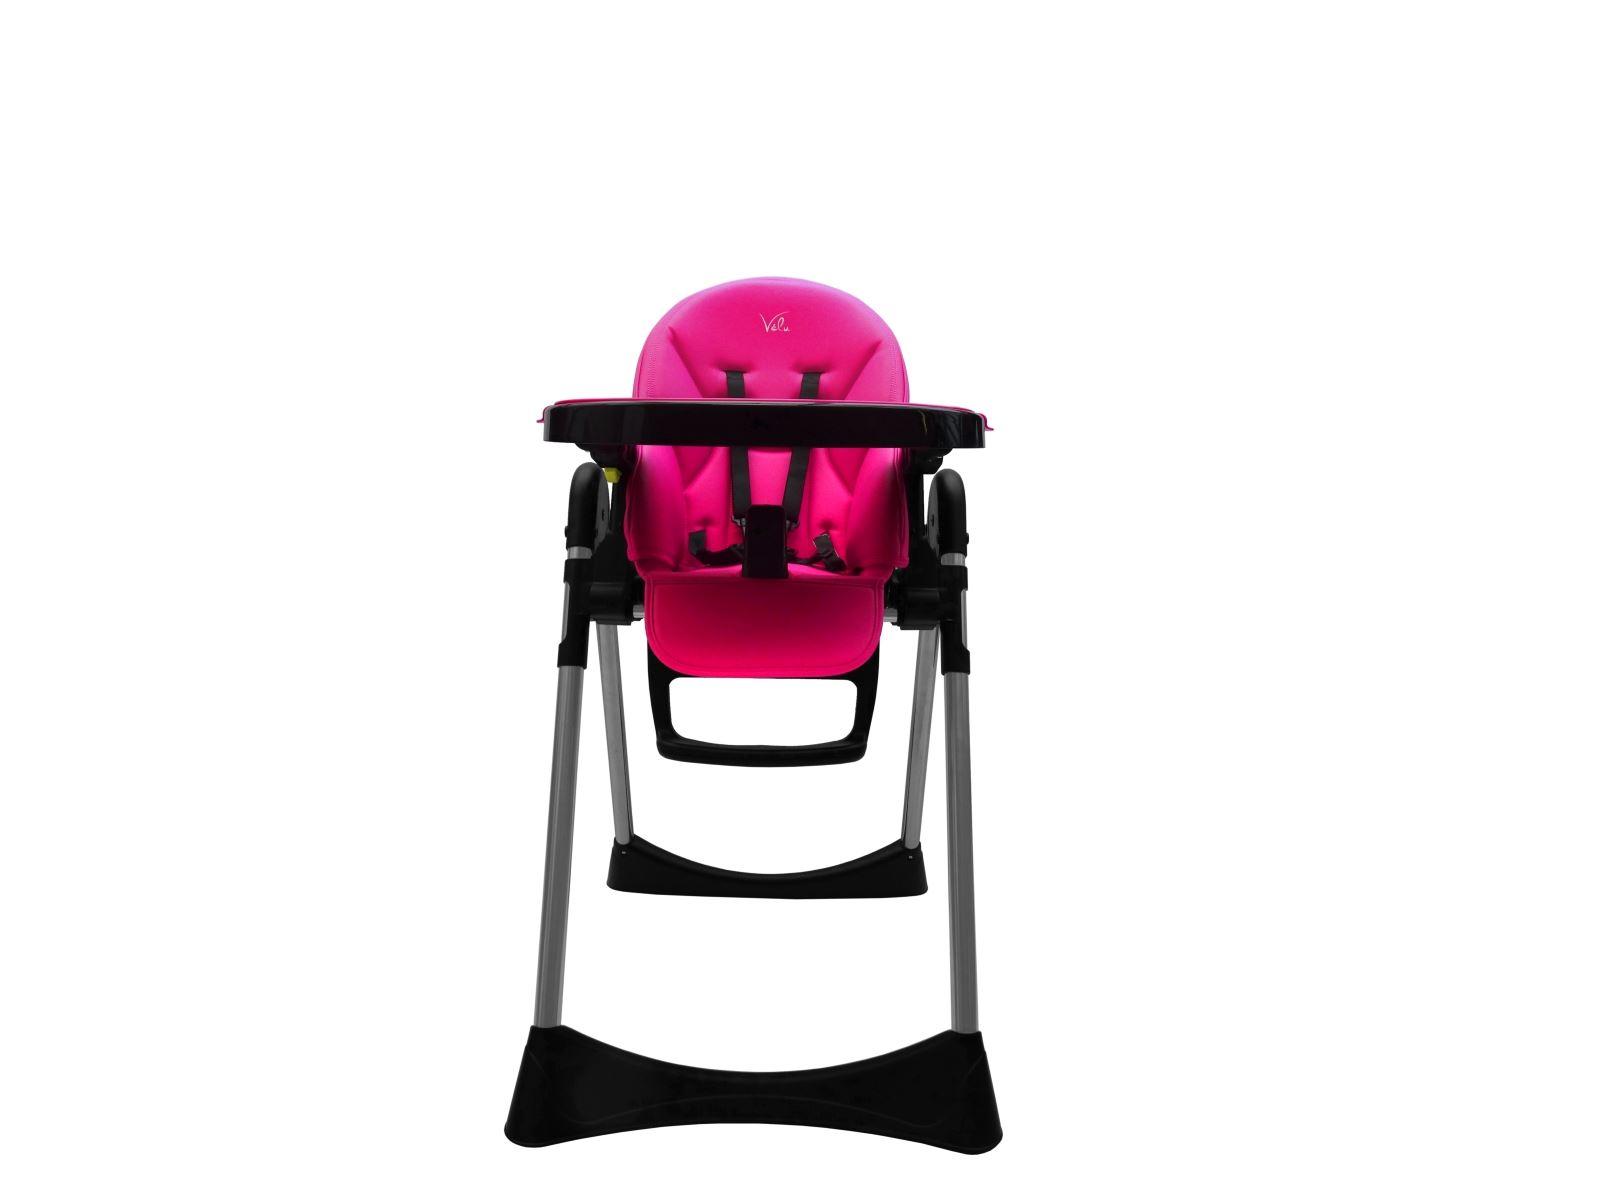 Velu Baby Child Highchair Feeding Chair pact High Chair PINK